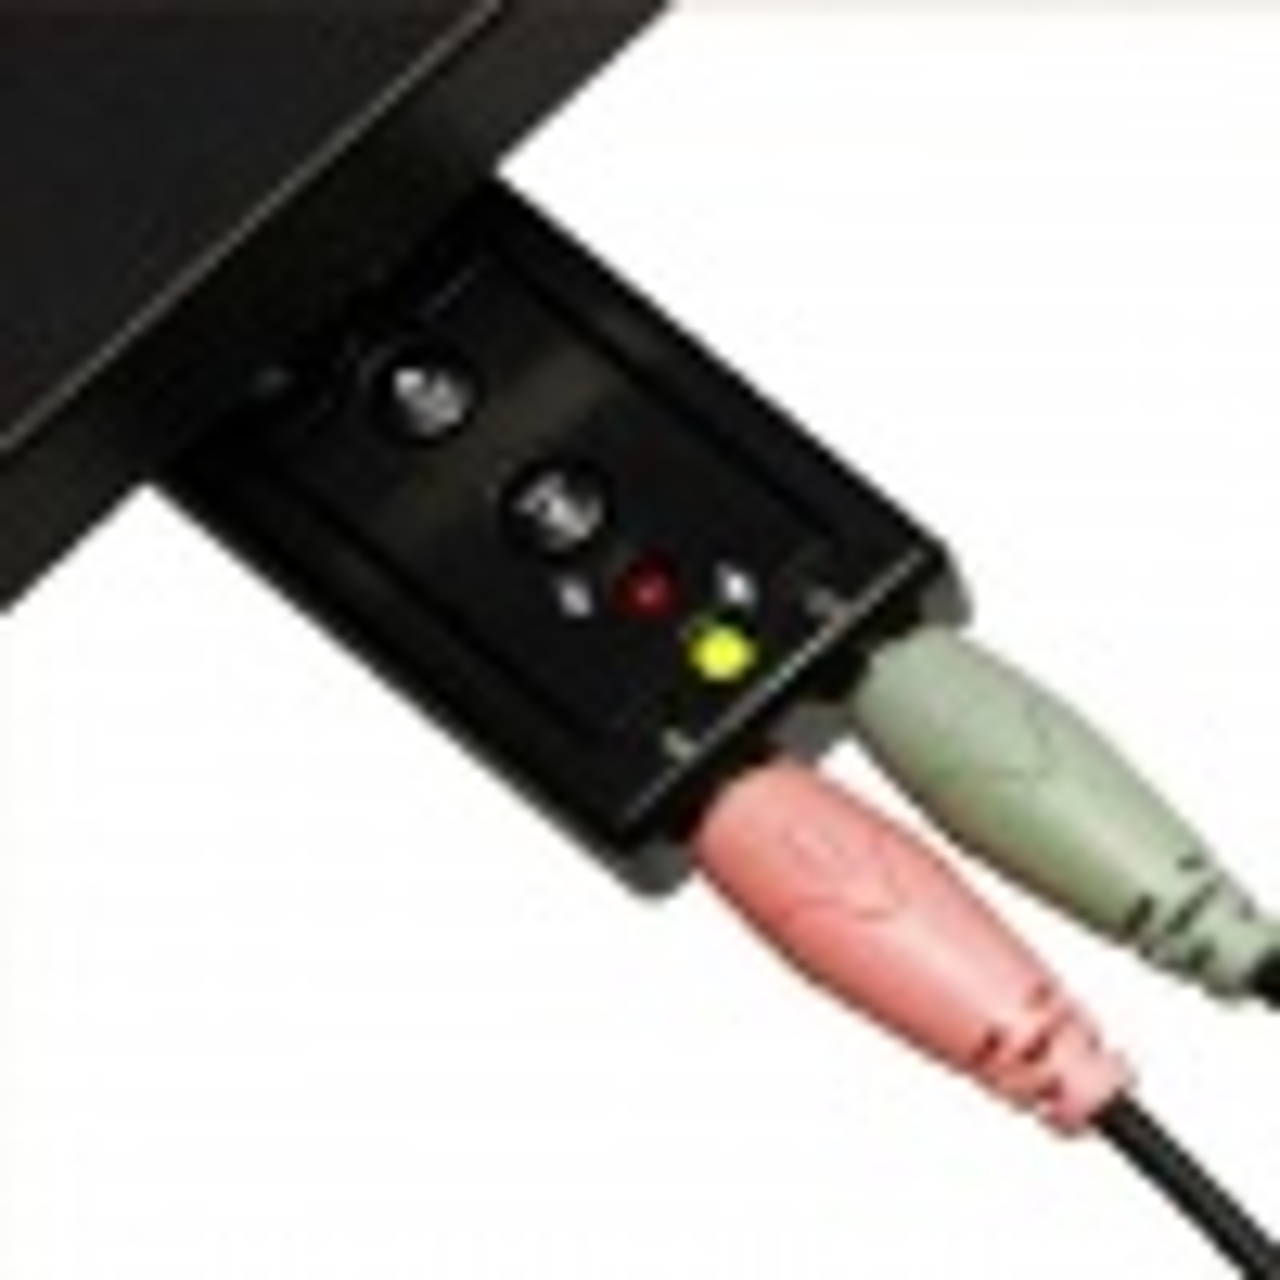 USB Ses Kartı 7.1 USB Stereo Ses Efektli Harici Ses Kartı Sound Kontrol